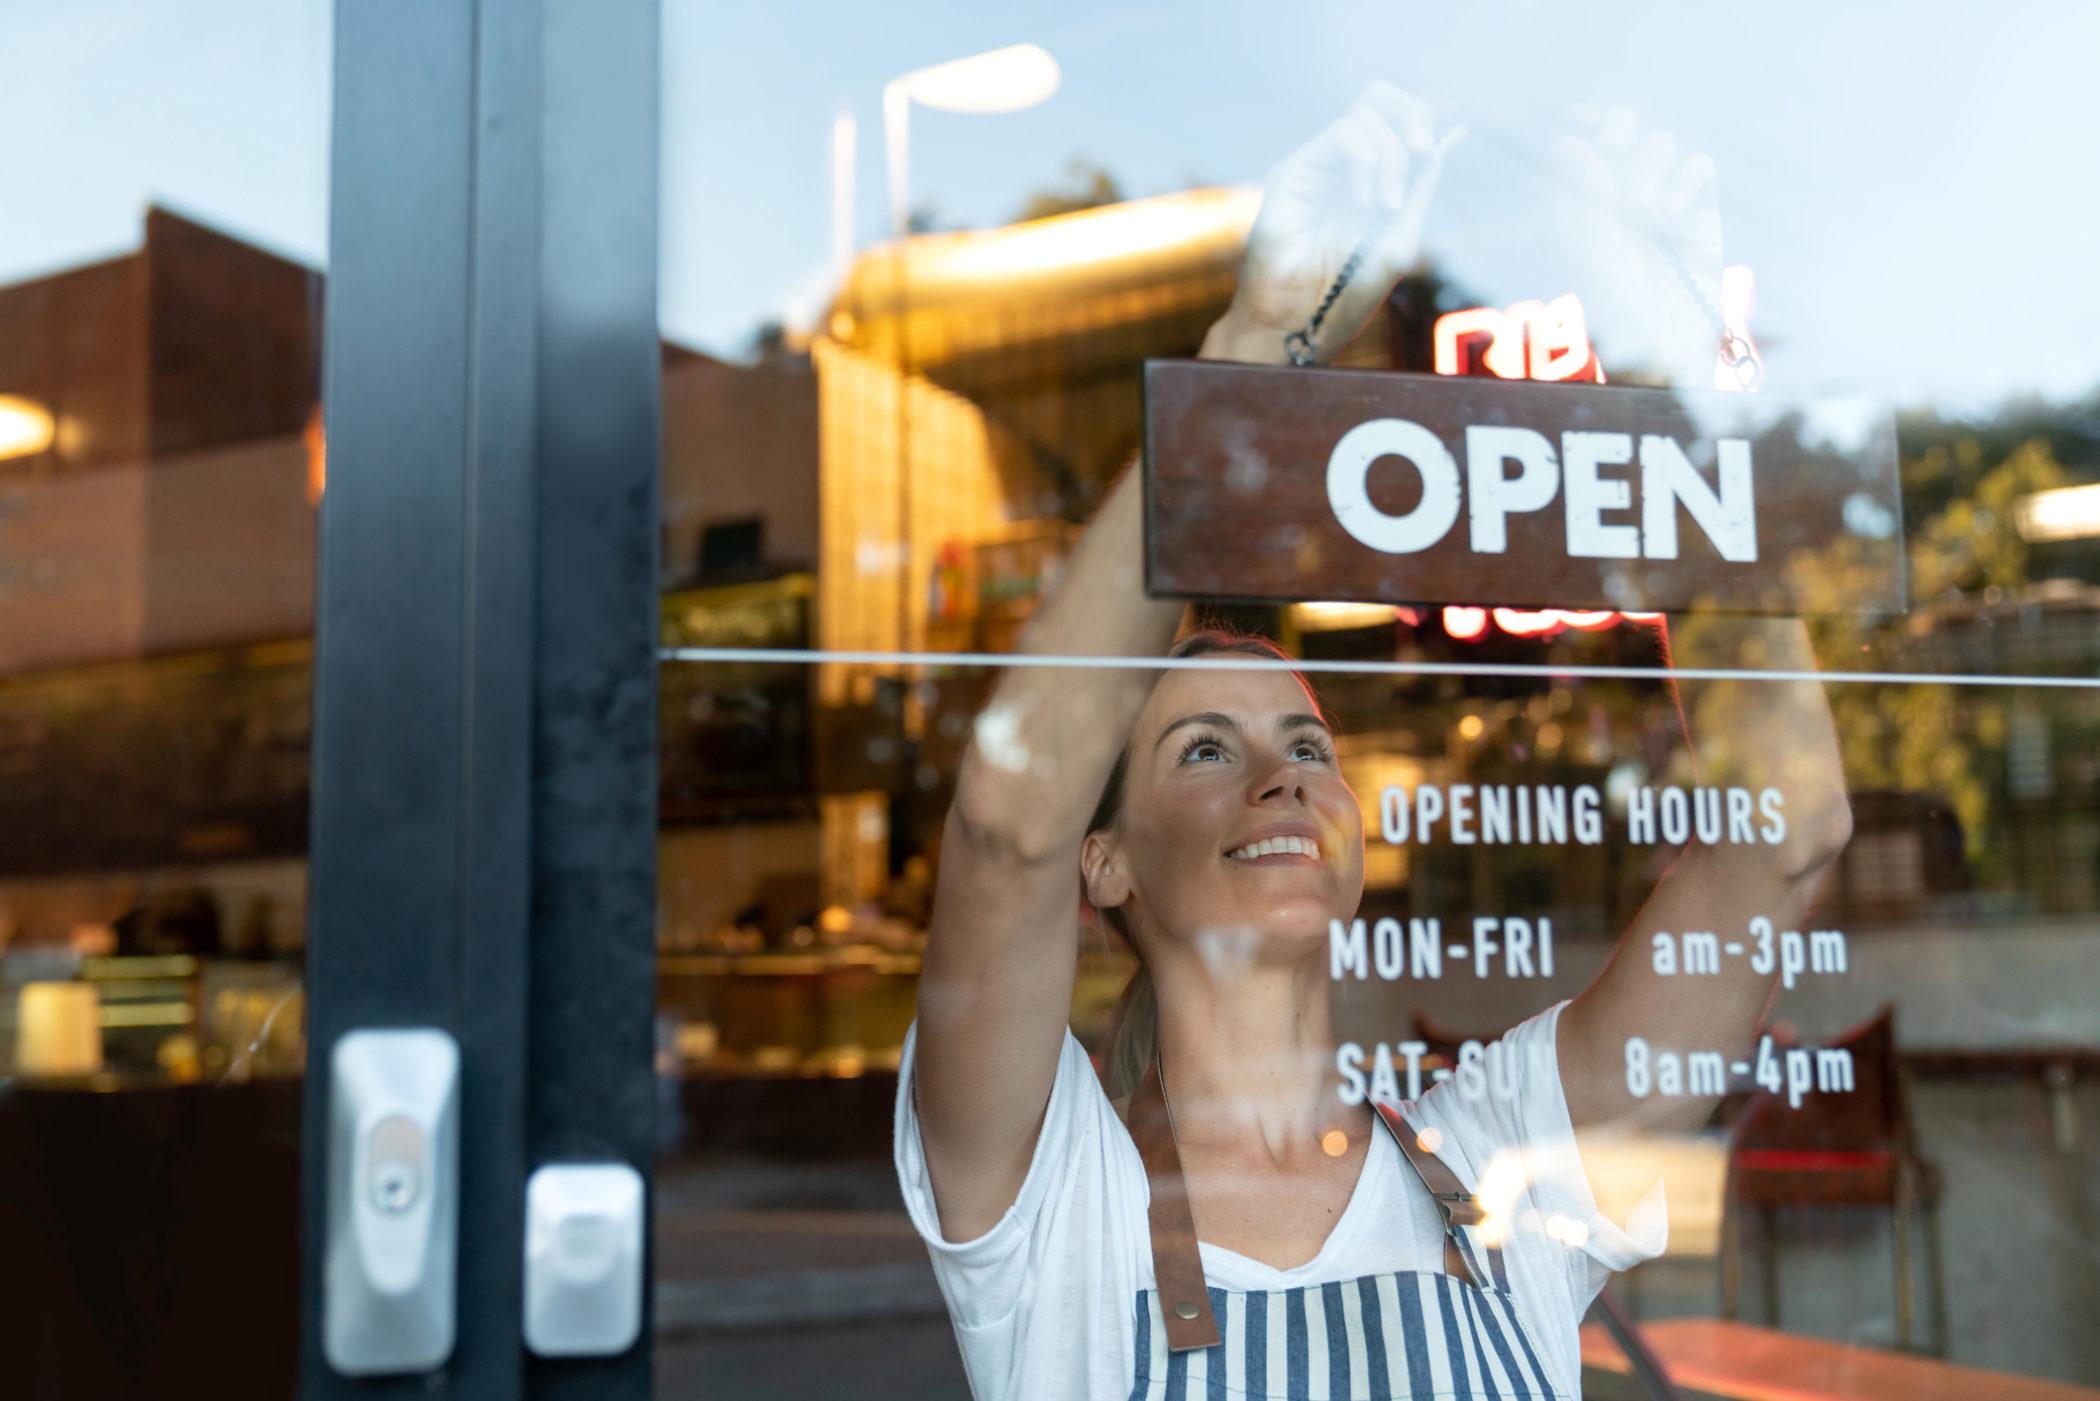 South Carolina: Not A Good Place To Start A Business – FITSNews